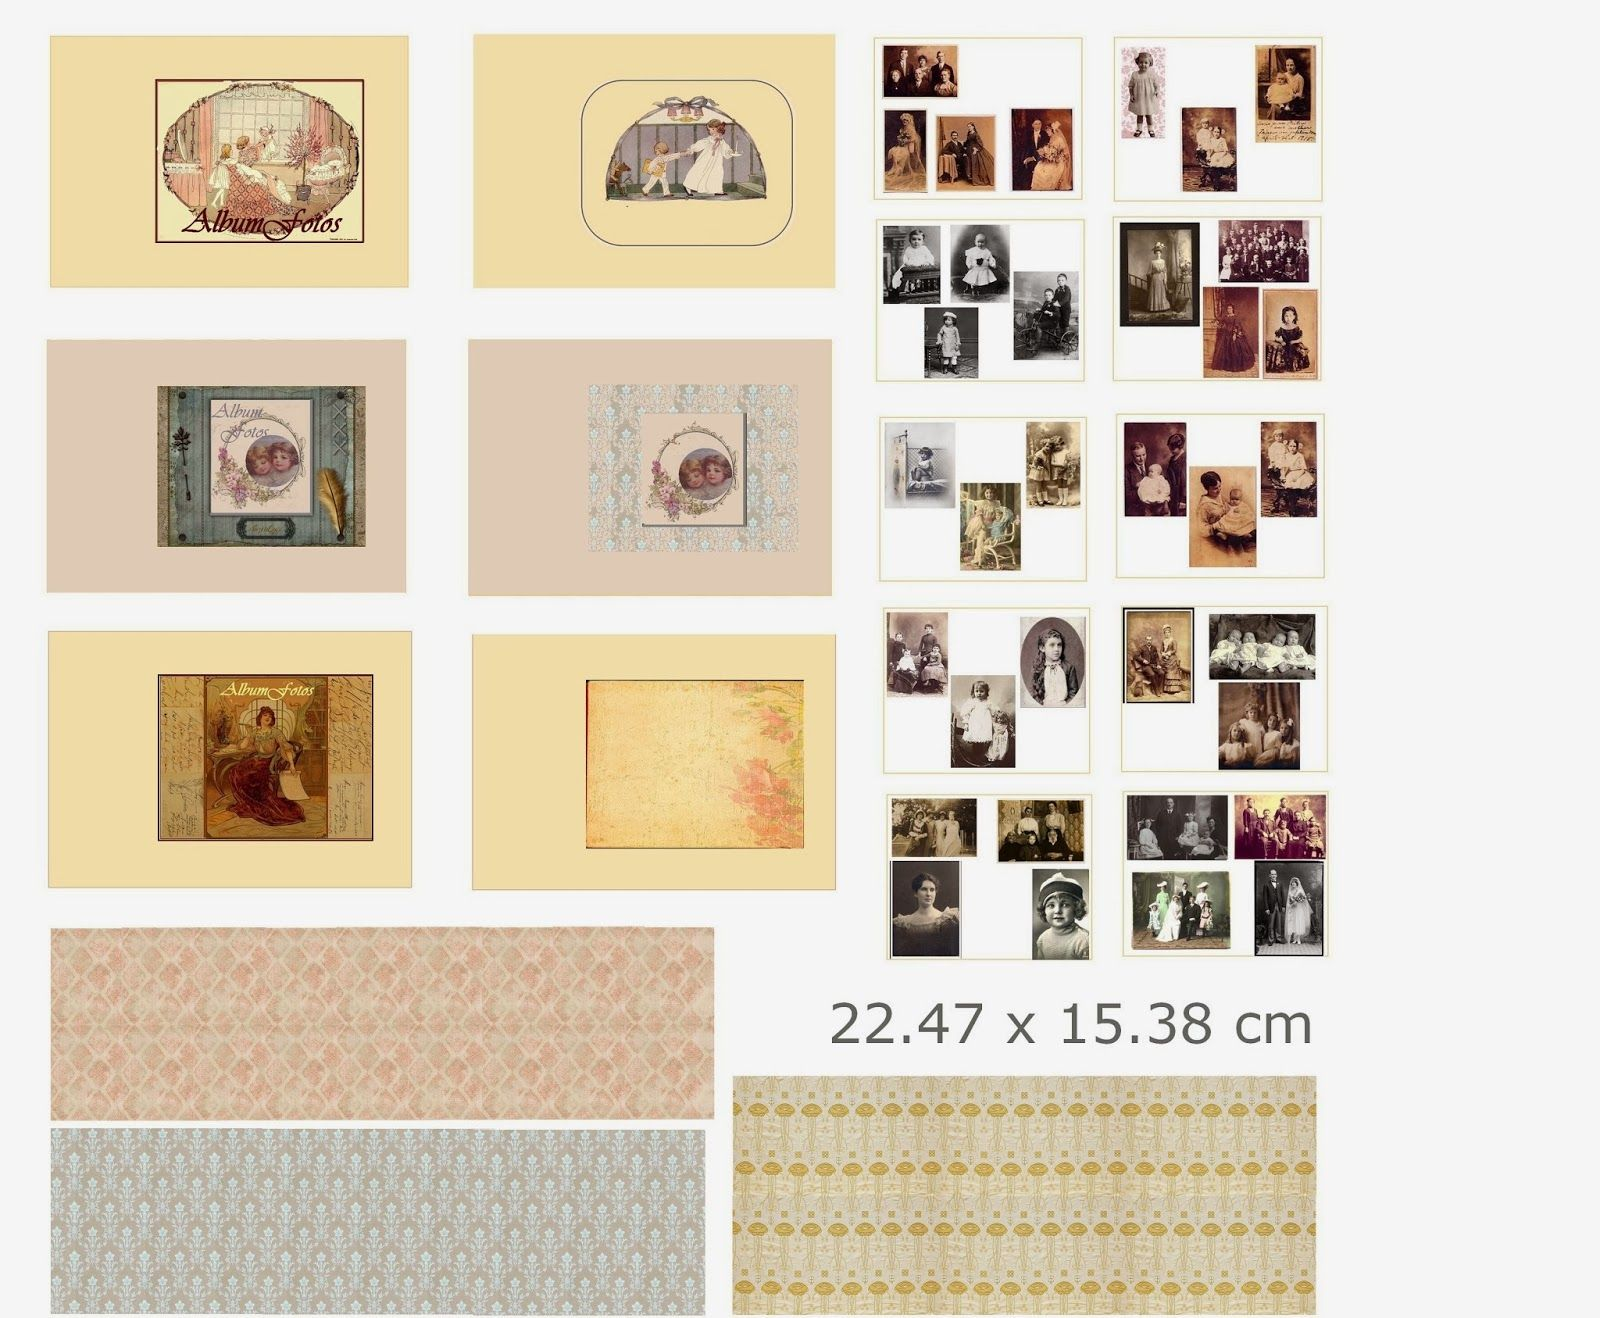 Dollhouse Photography Calendar : Las cosas de meapunto calendario adviento dia album